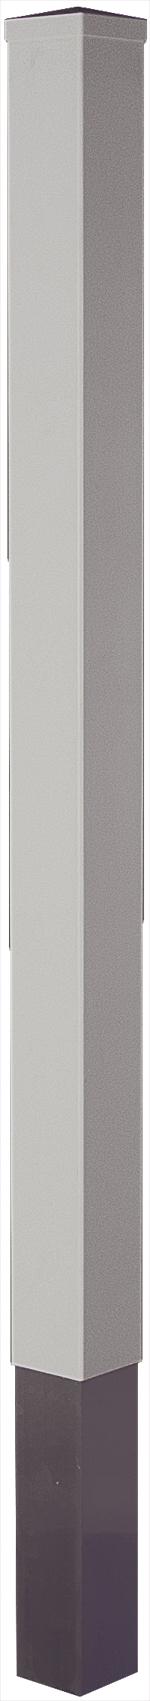 LIGHTLINE Kunststoff-Pfosten 9x9 cm mit Alu-Kern